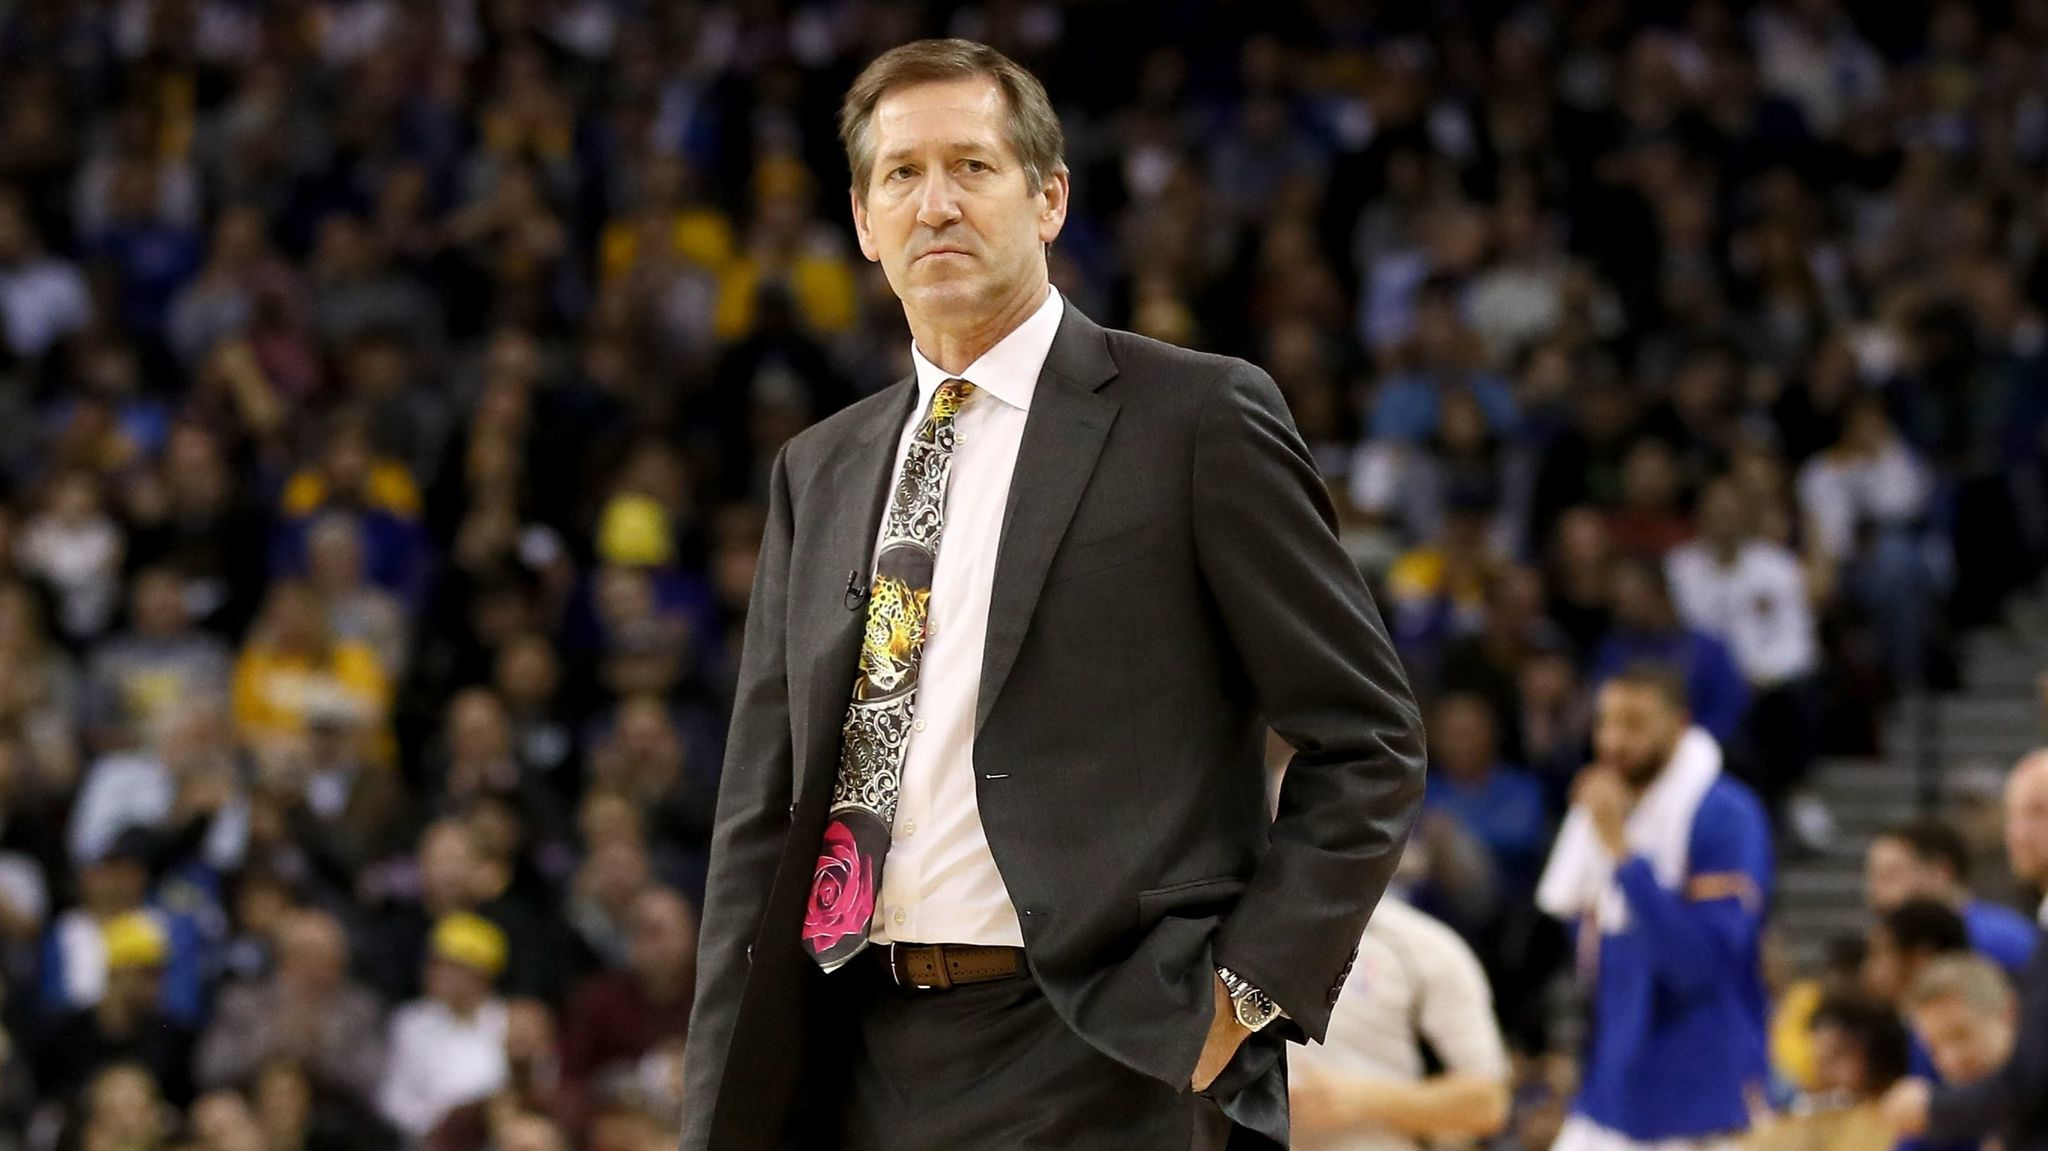 Knicks Coach Jeff Hornacek wears a tie honoring Craig Sager on Thursday night.